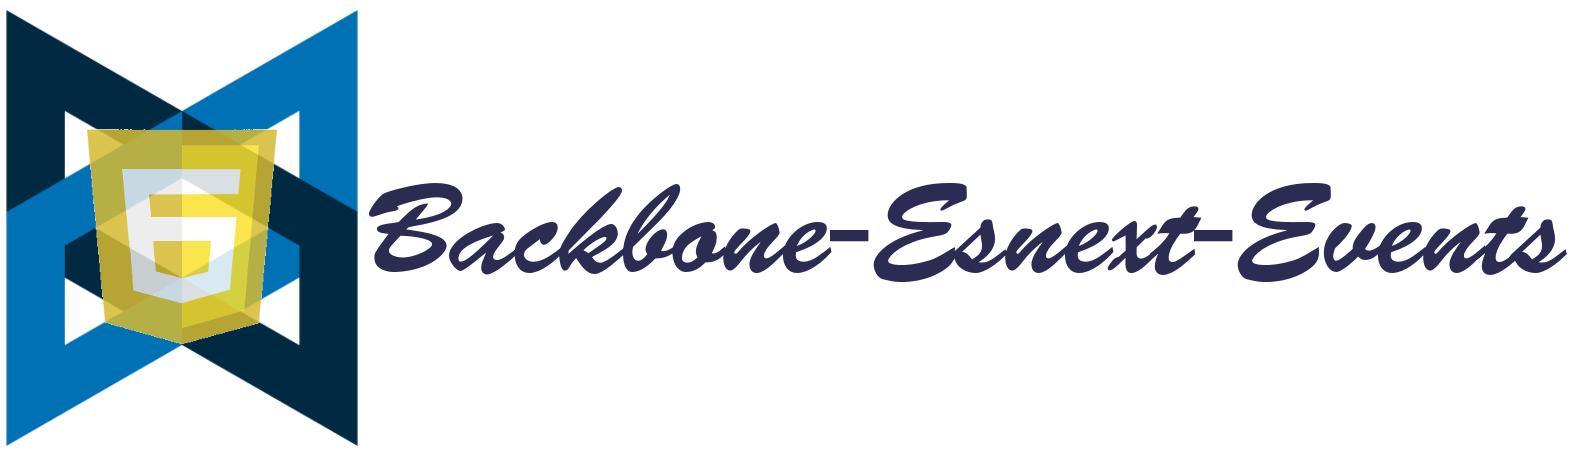 backbone-esnext-events